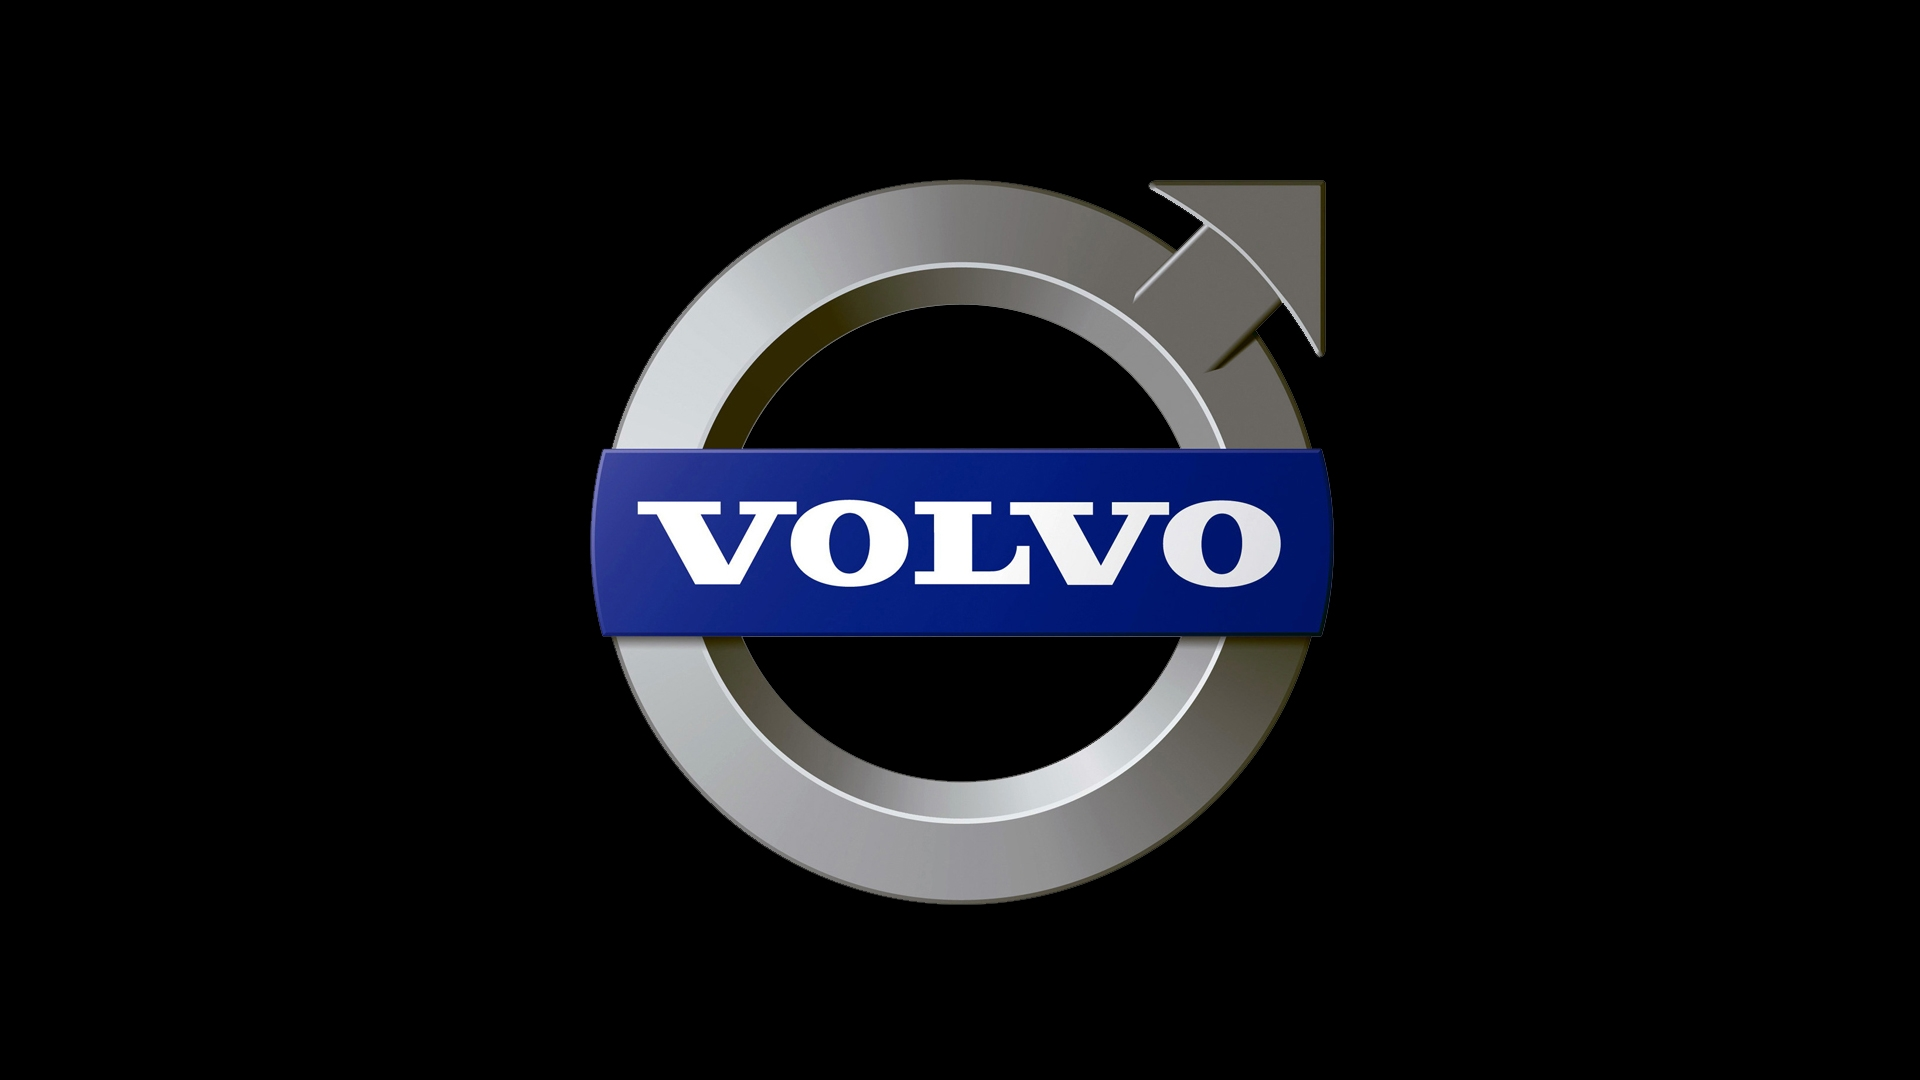 volvo-symbol-2